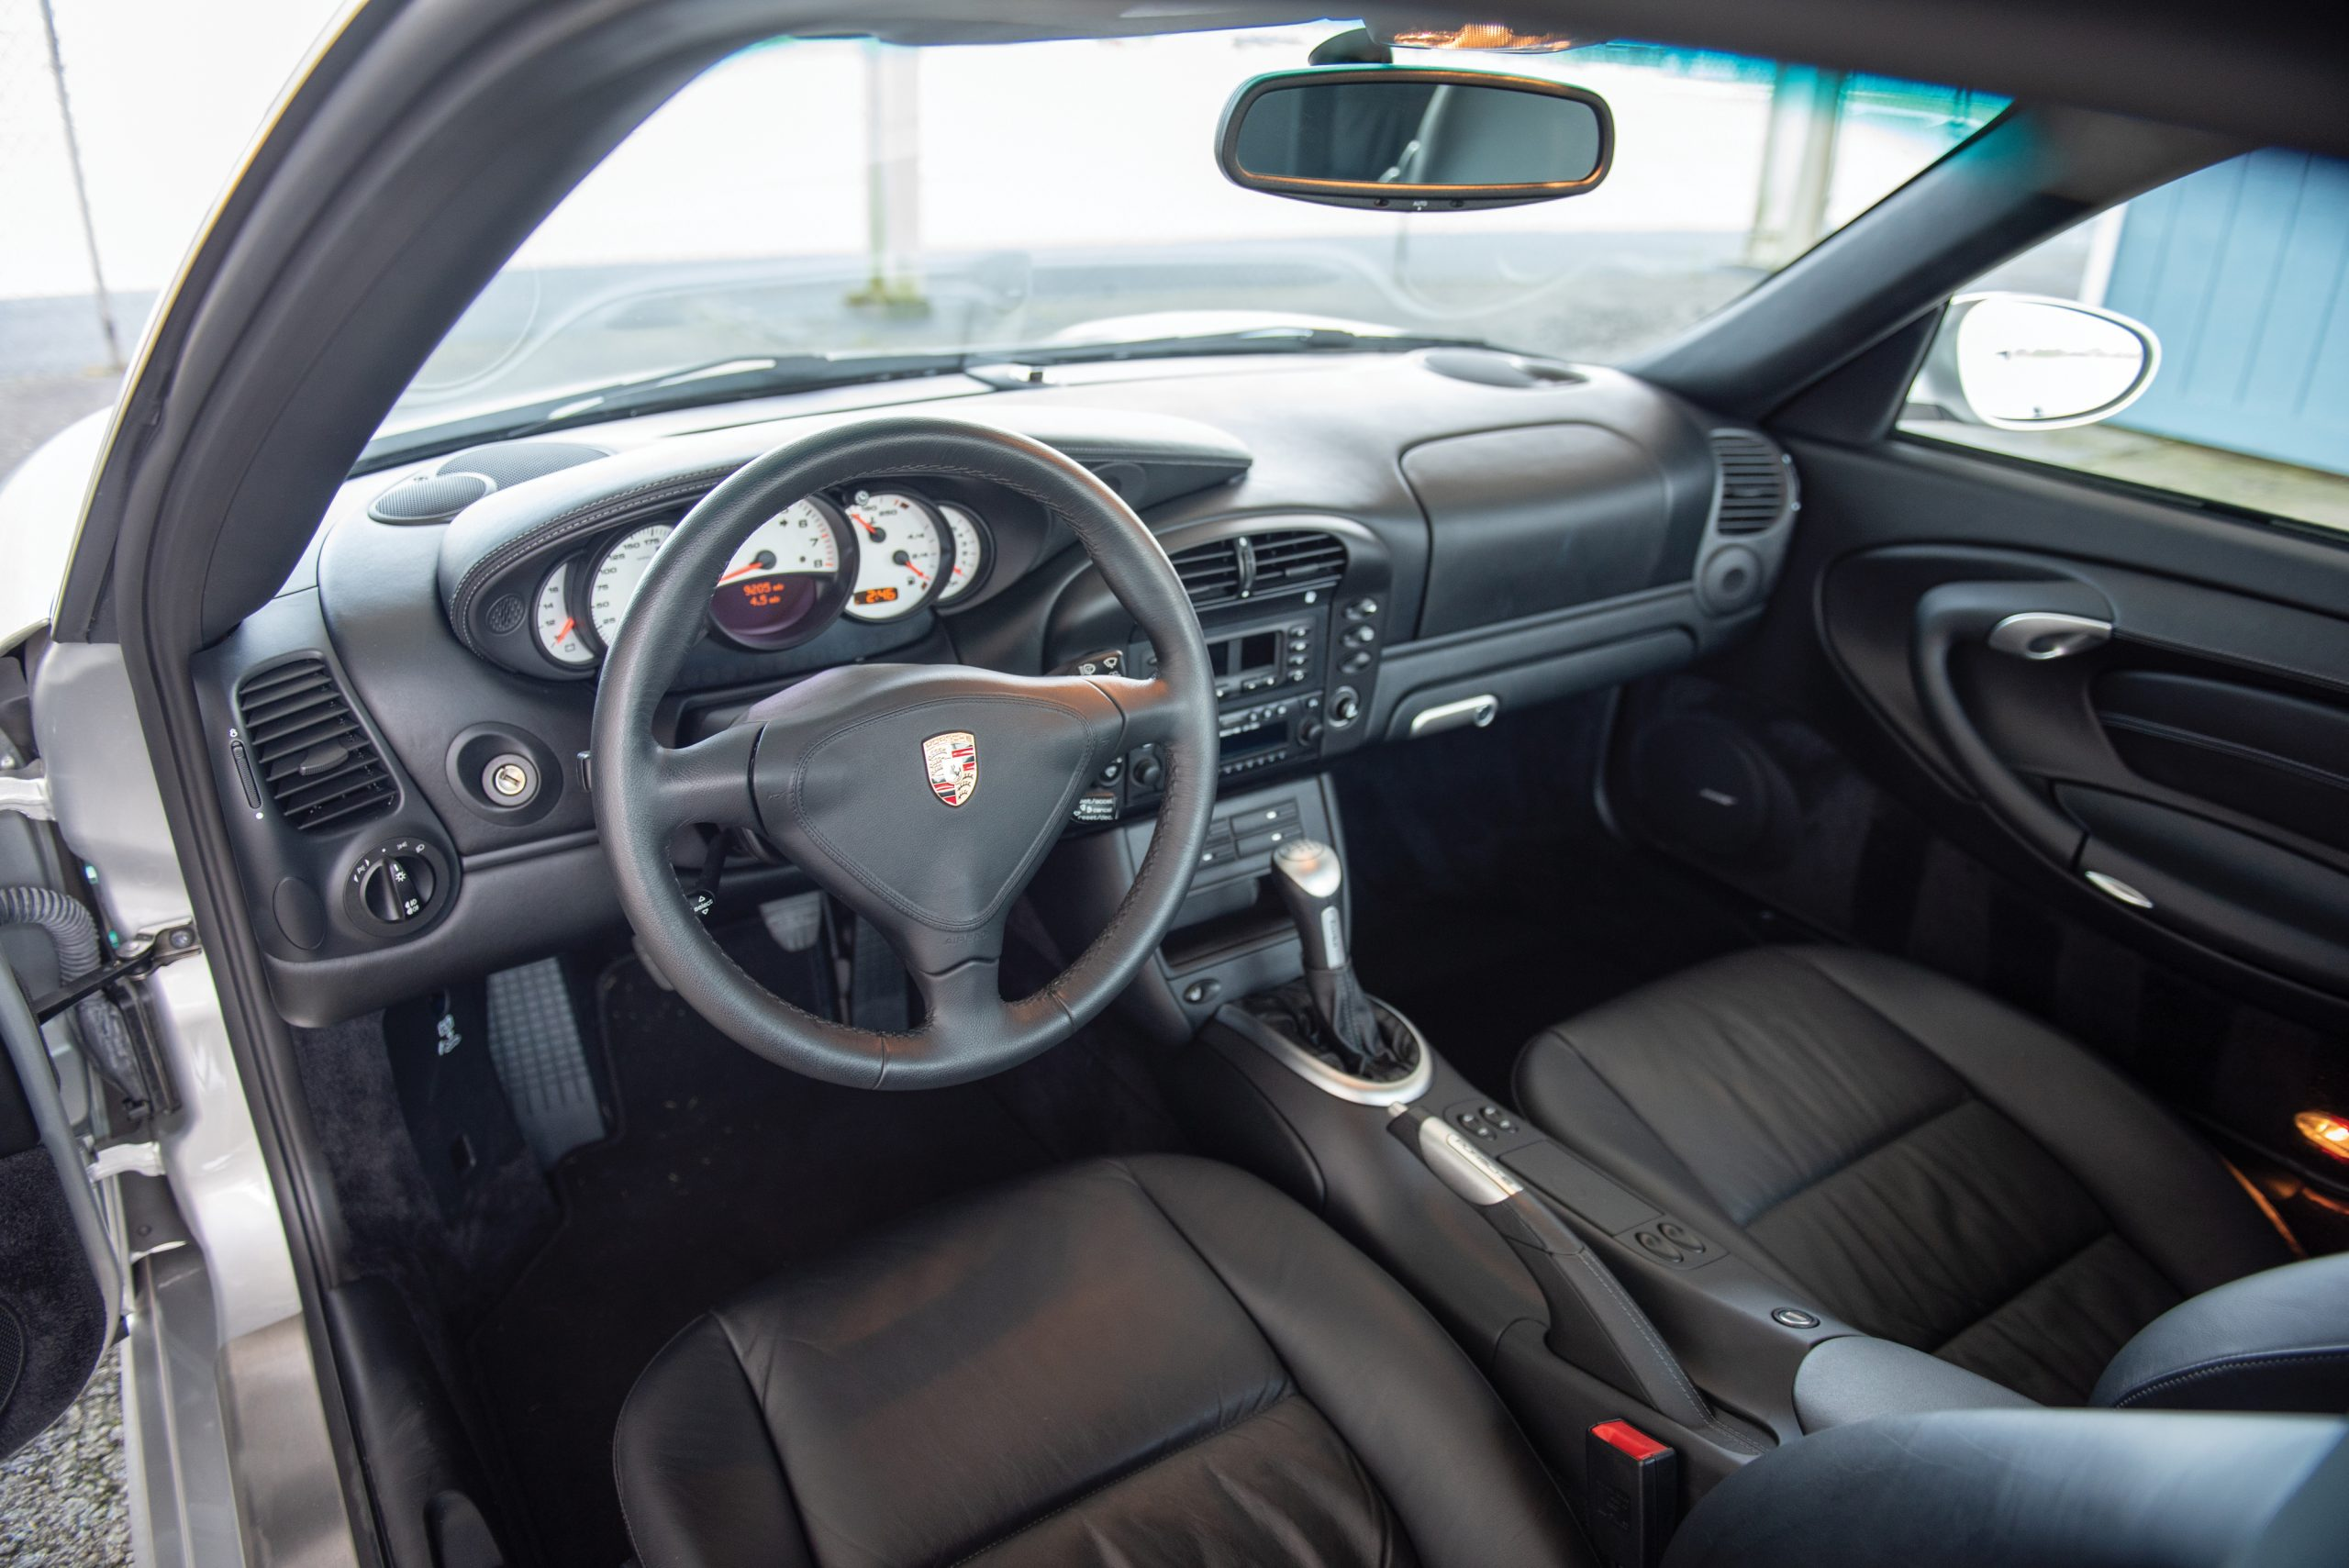 2002 Porsche 911 Turbo Coupe interior